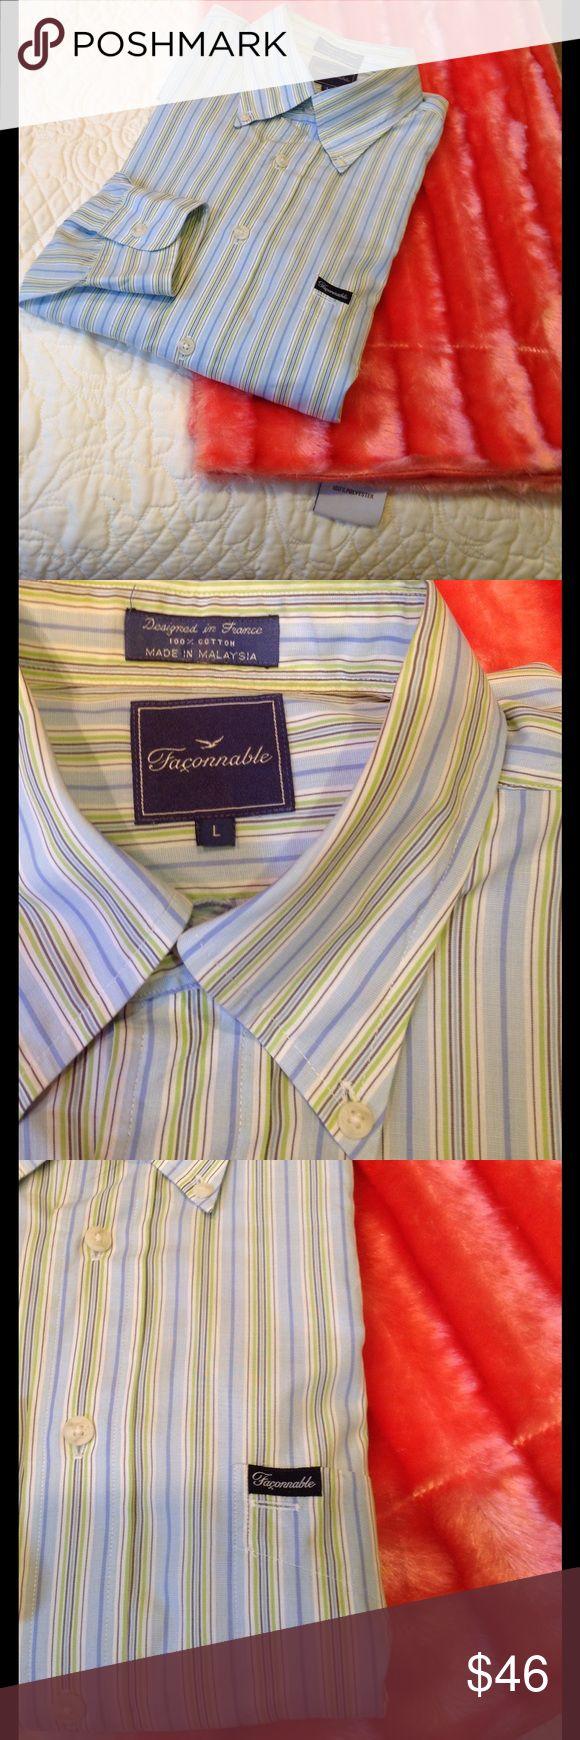 Faconnable men's long-sleeve striped shirt. Size L Faconnable men's long-sleeves blue, green, purple and white striped shirt. 100% cotton. Size L. Faconnable Shirts Dress Shirts